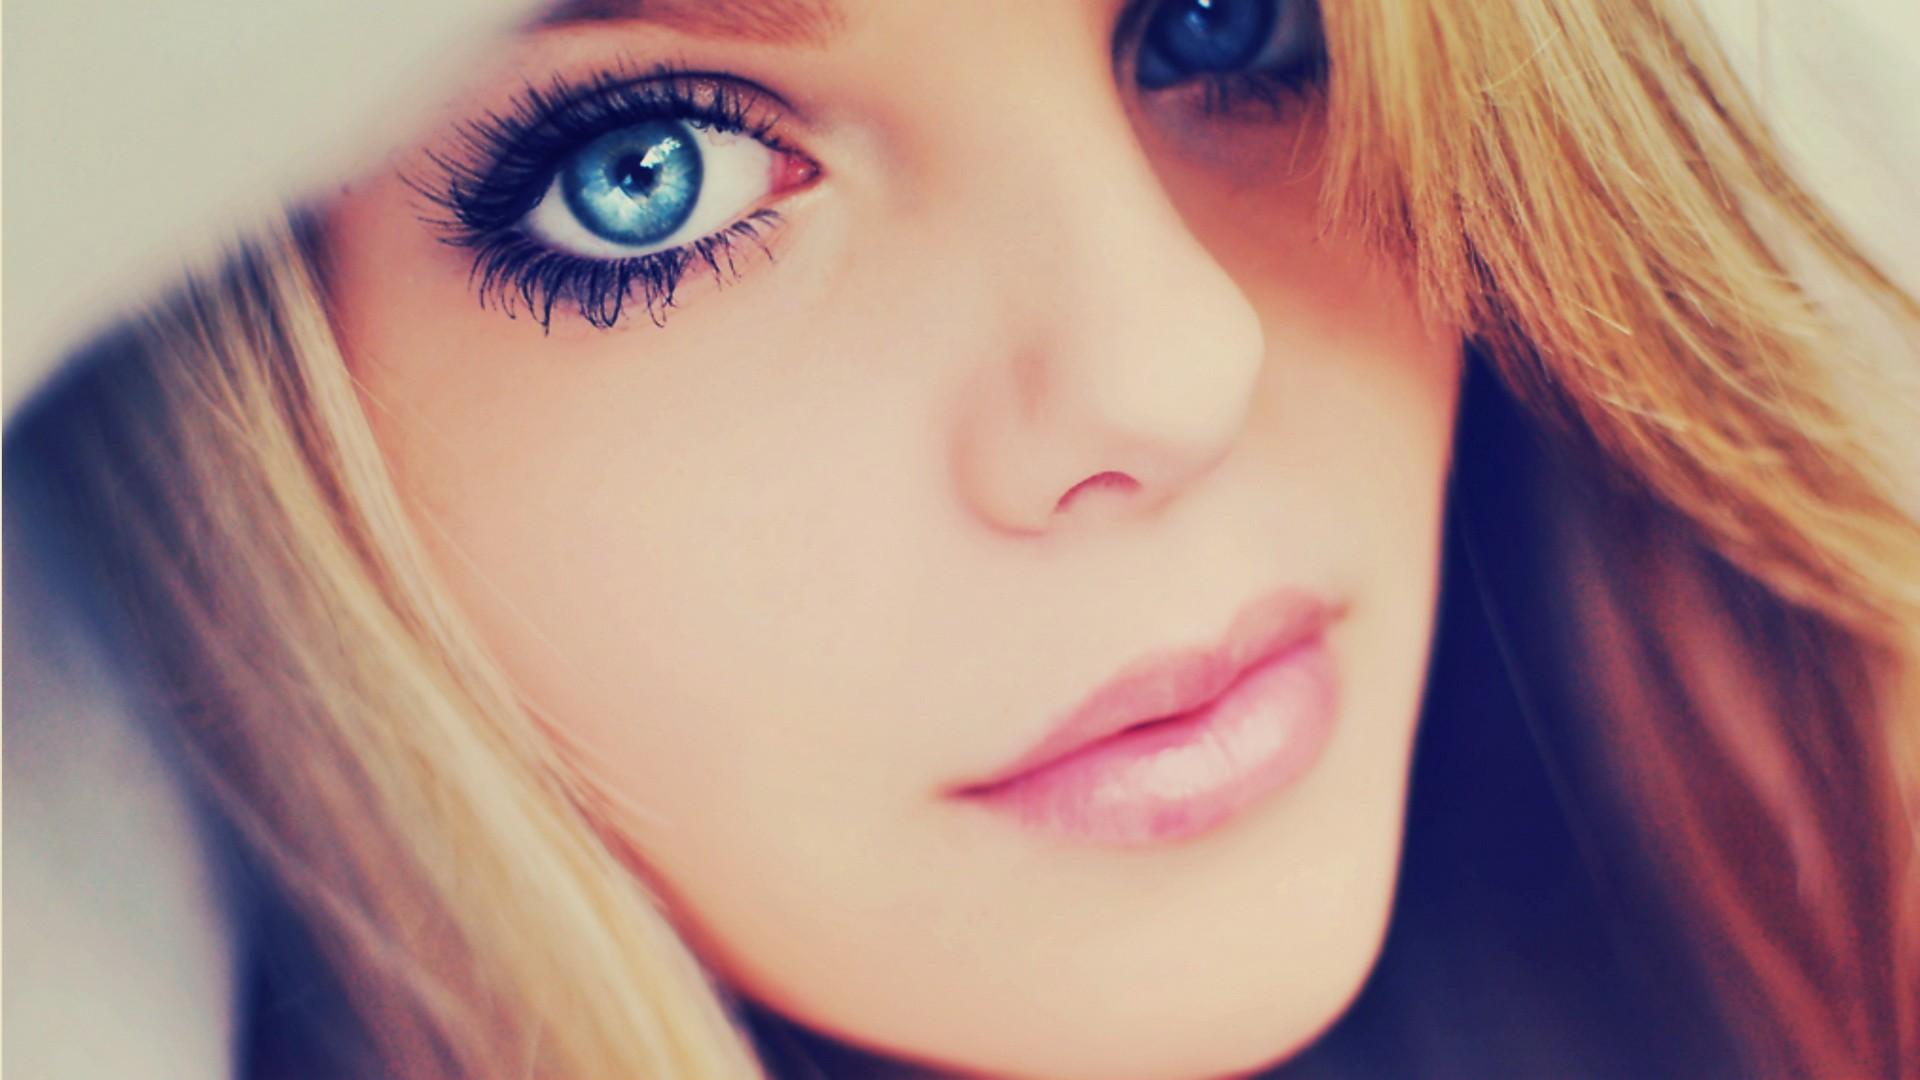 بالصور صور عيون بنات , عيون ساحرة 5746 2